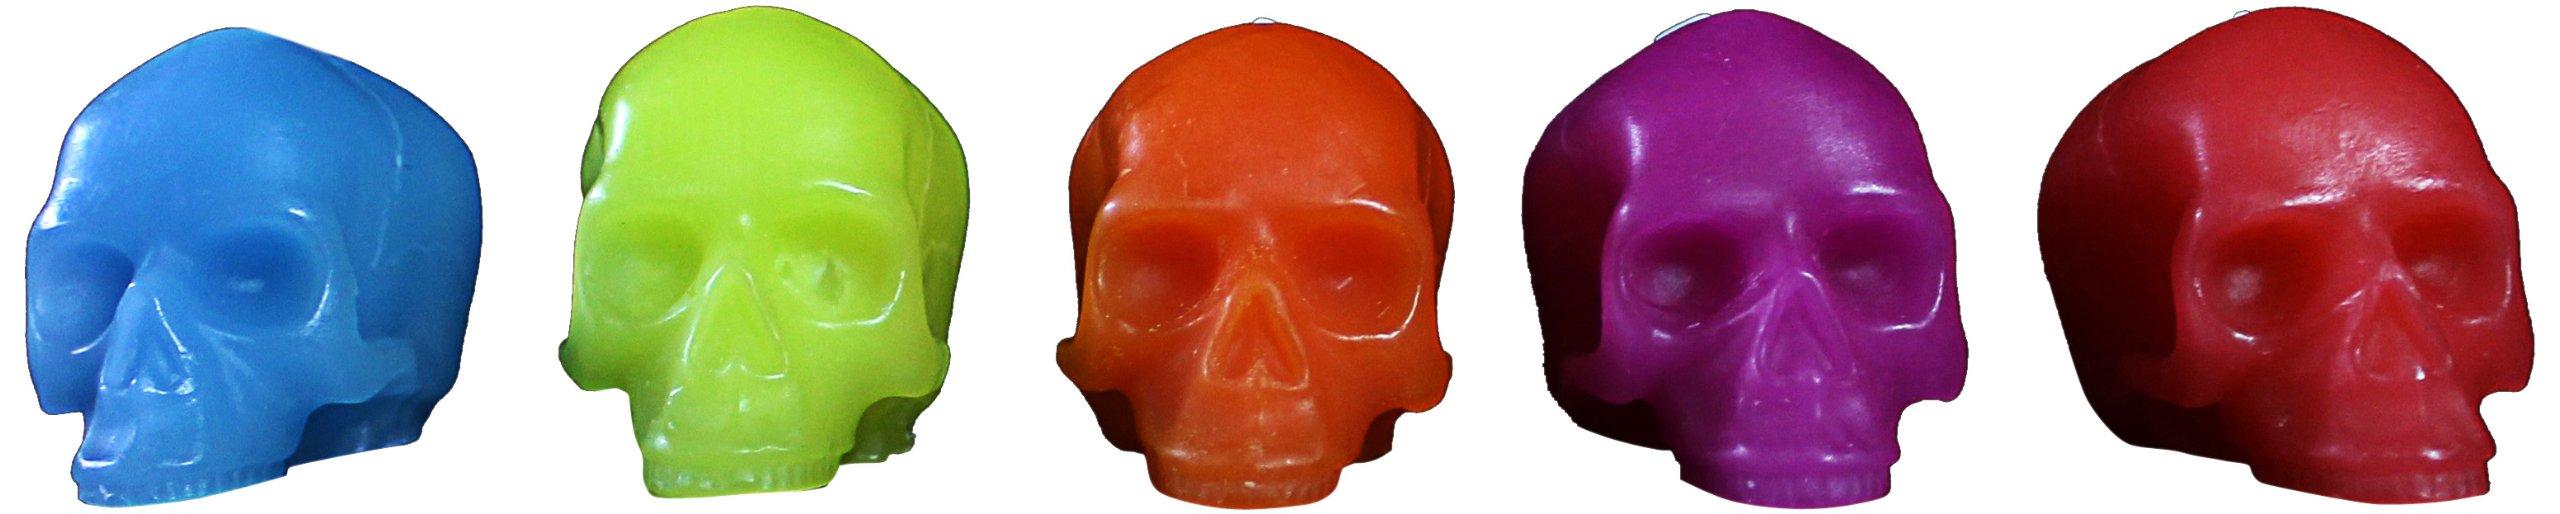 D.L. Bright Skull Candles Gift, Mini, Set of 5